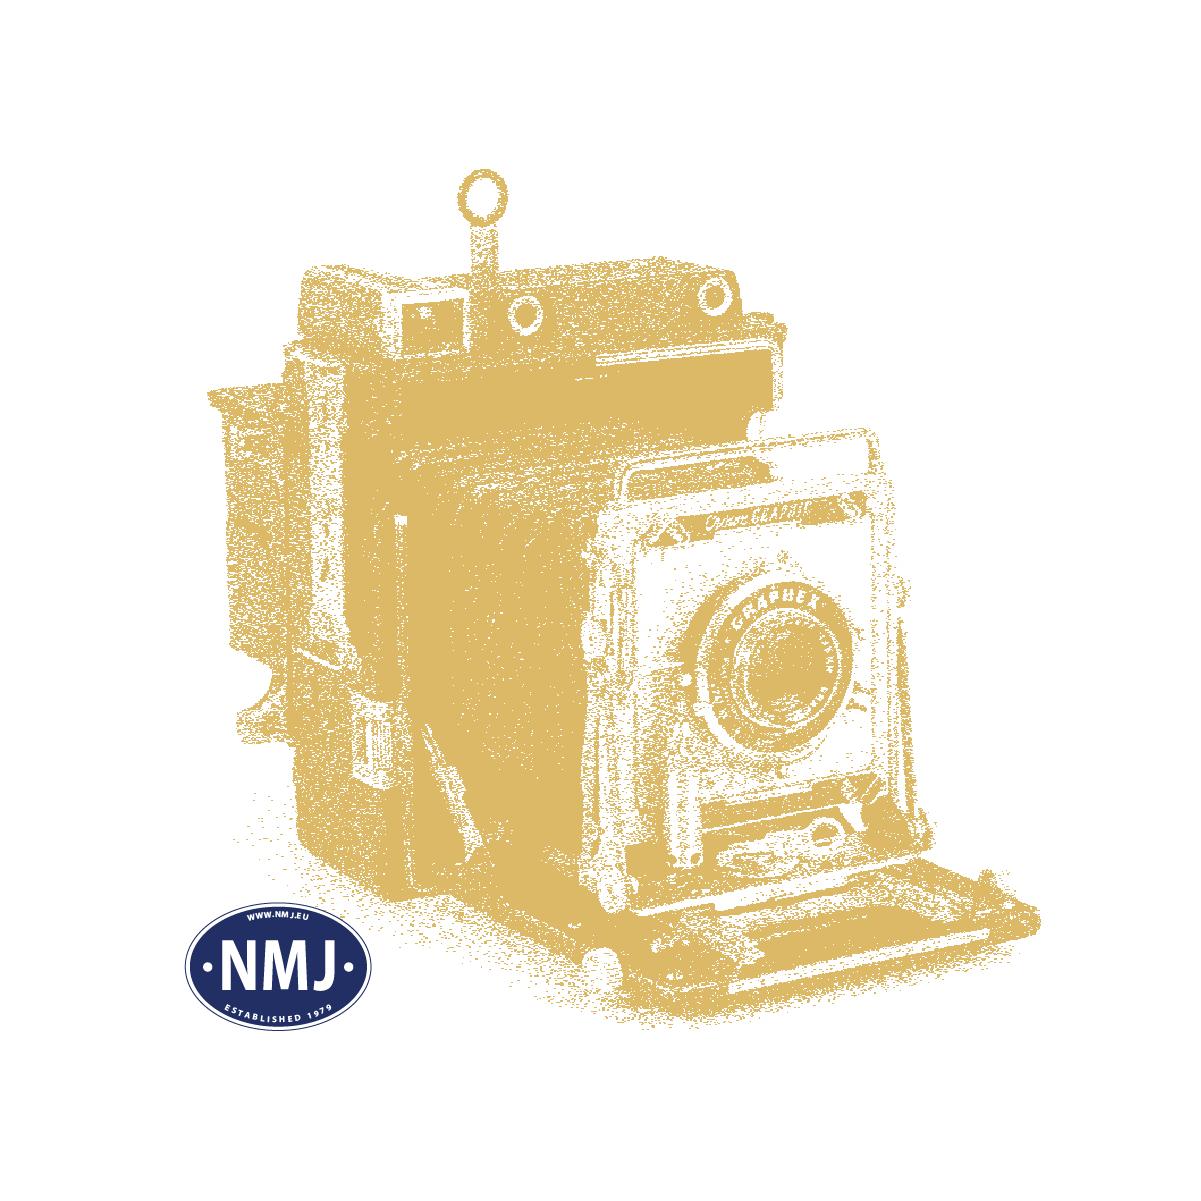 NMJ Superline NSB Tl3 14539, 0-Scala